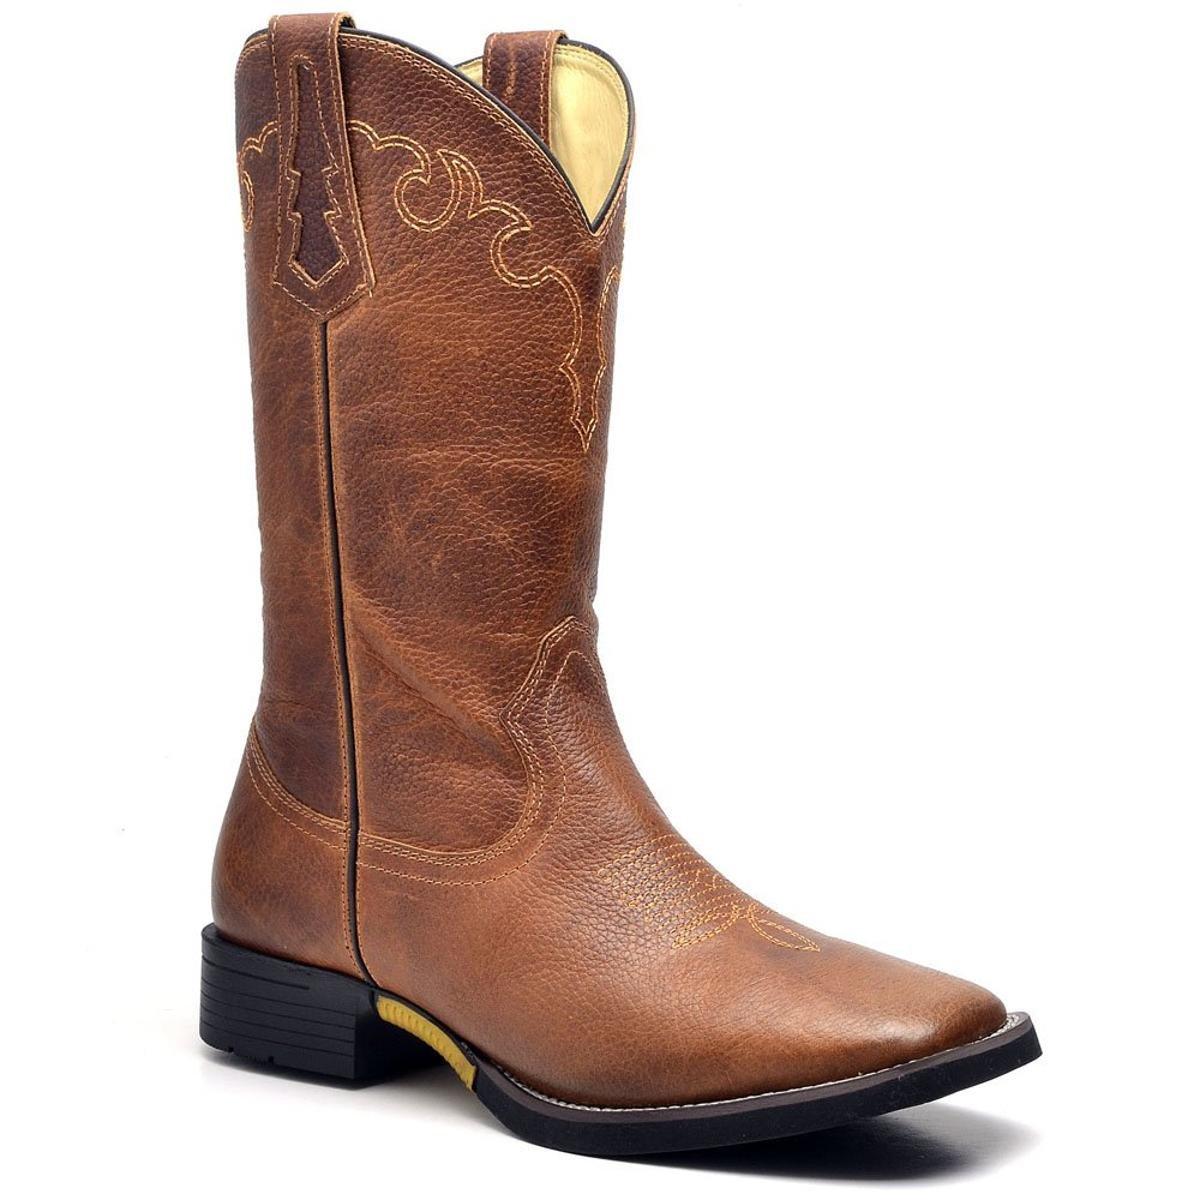 Bota Couro Country Texana Top Franca Shoes Masculino - Marrom ... 92ecb7e8238